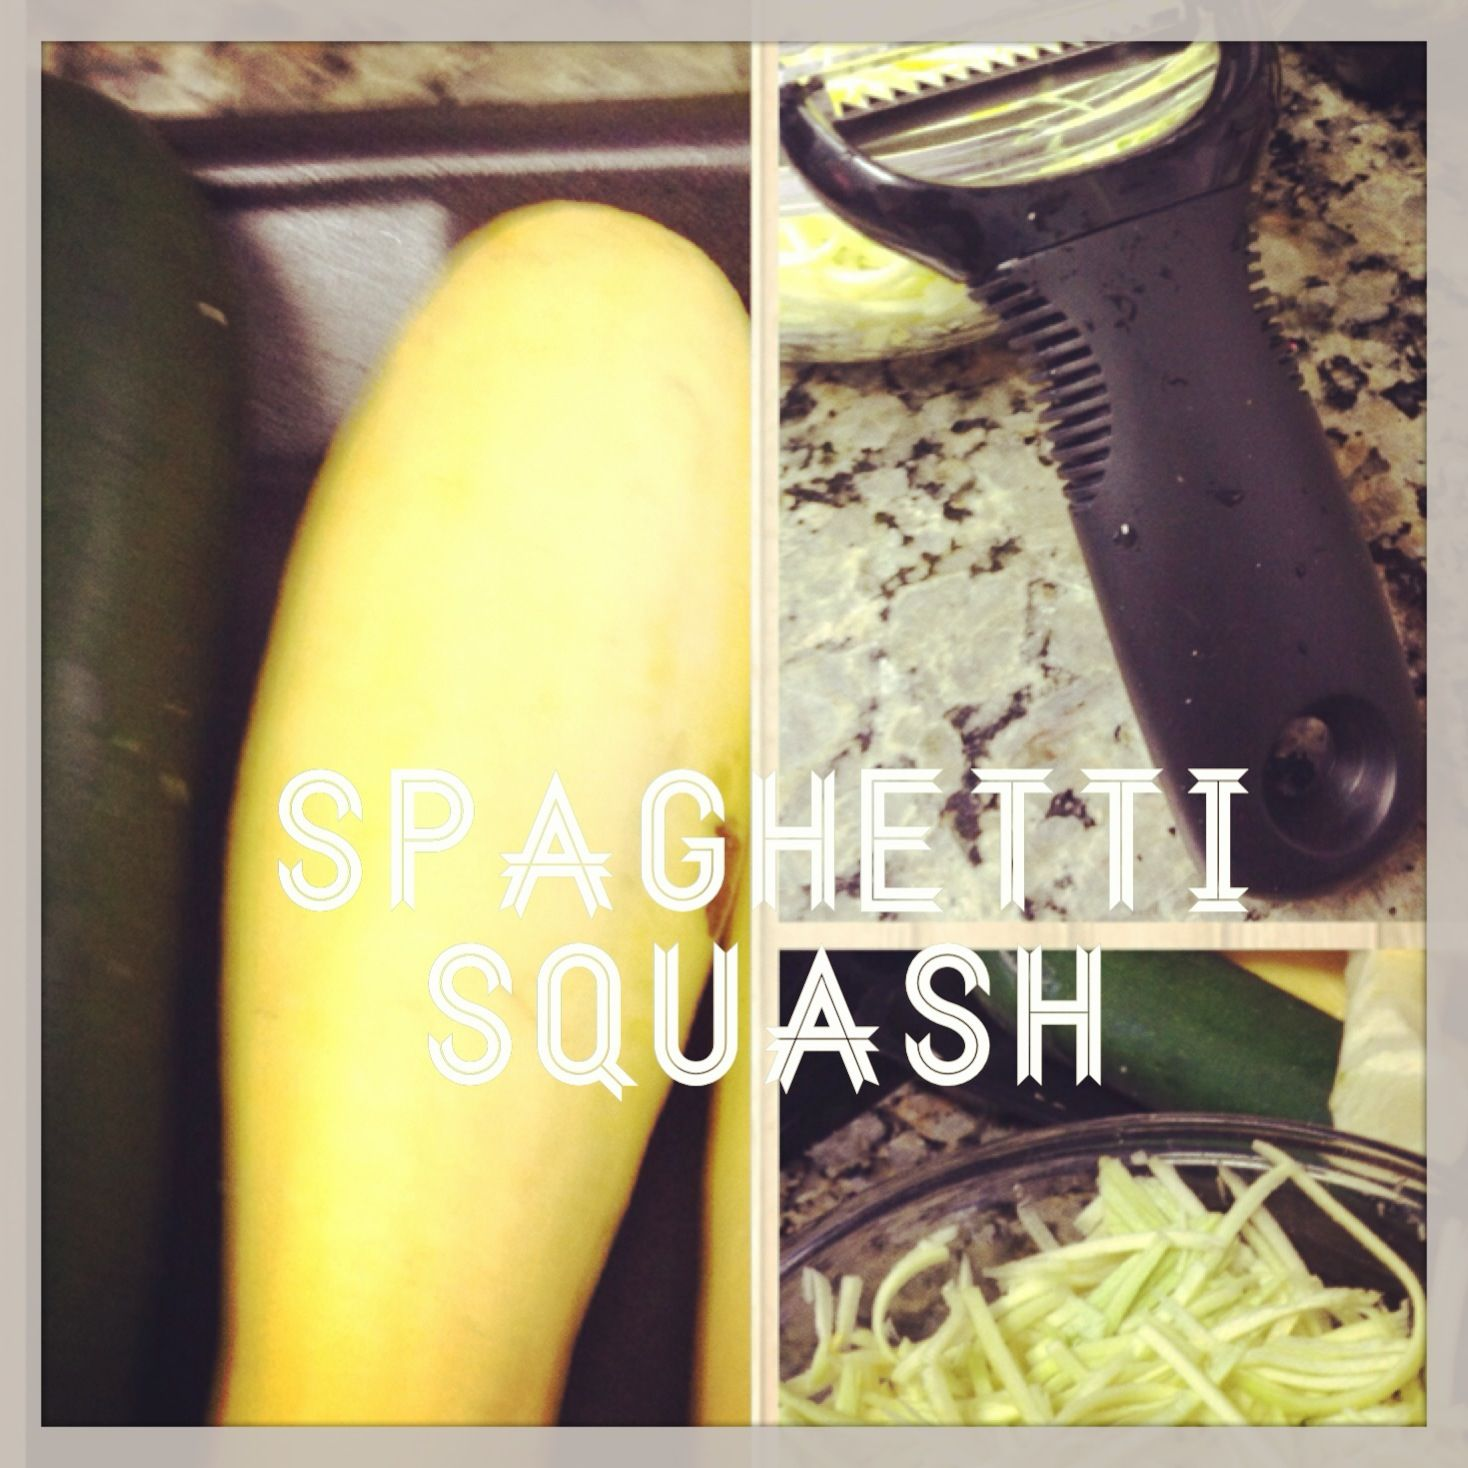 Spaghetti squash with julienne peeler